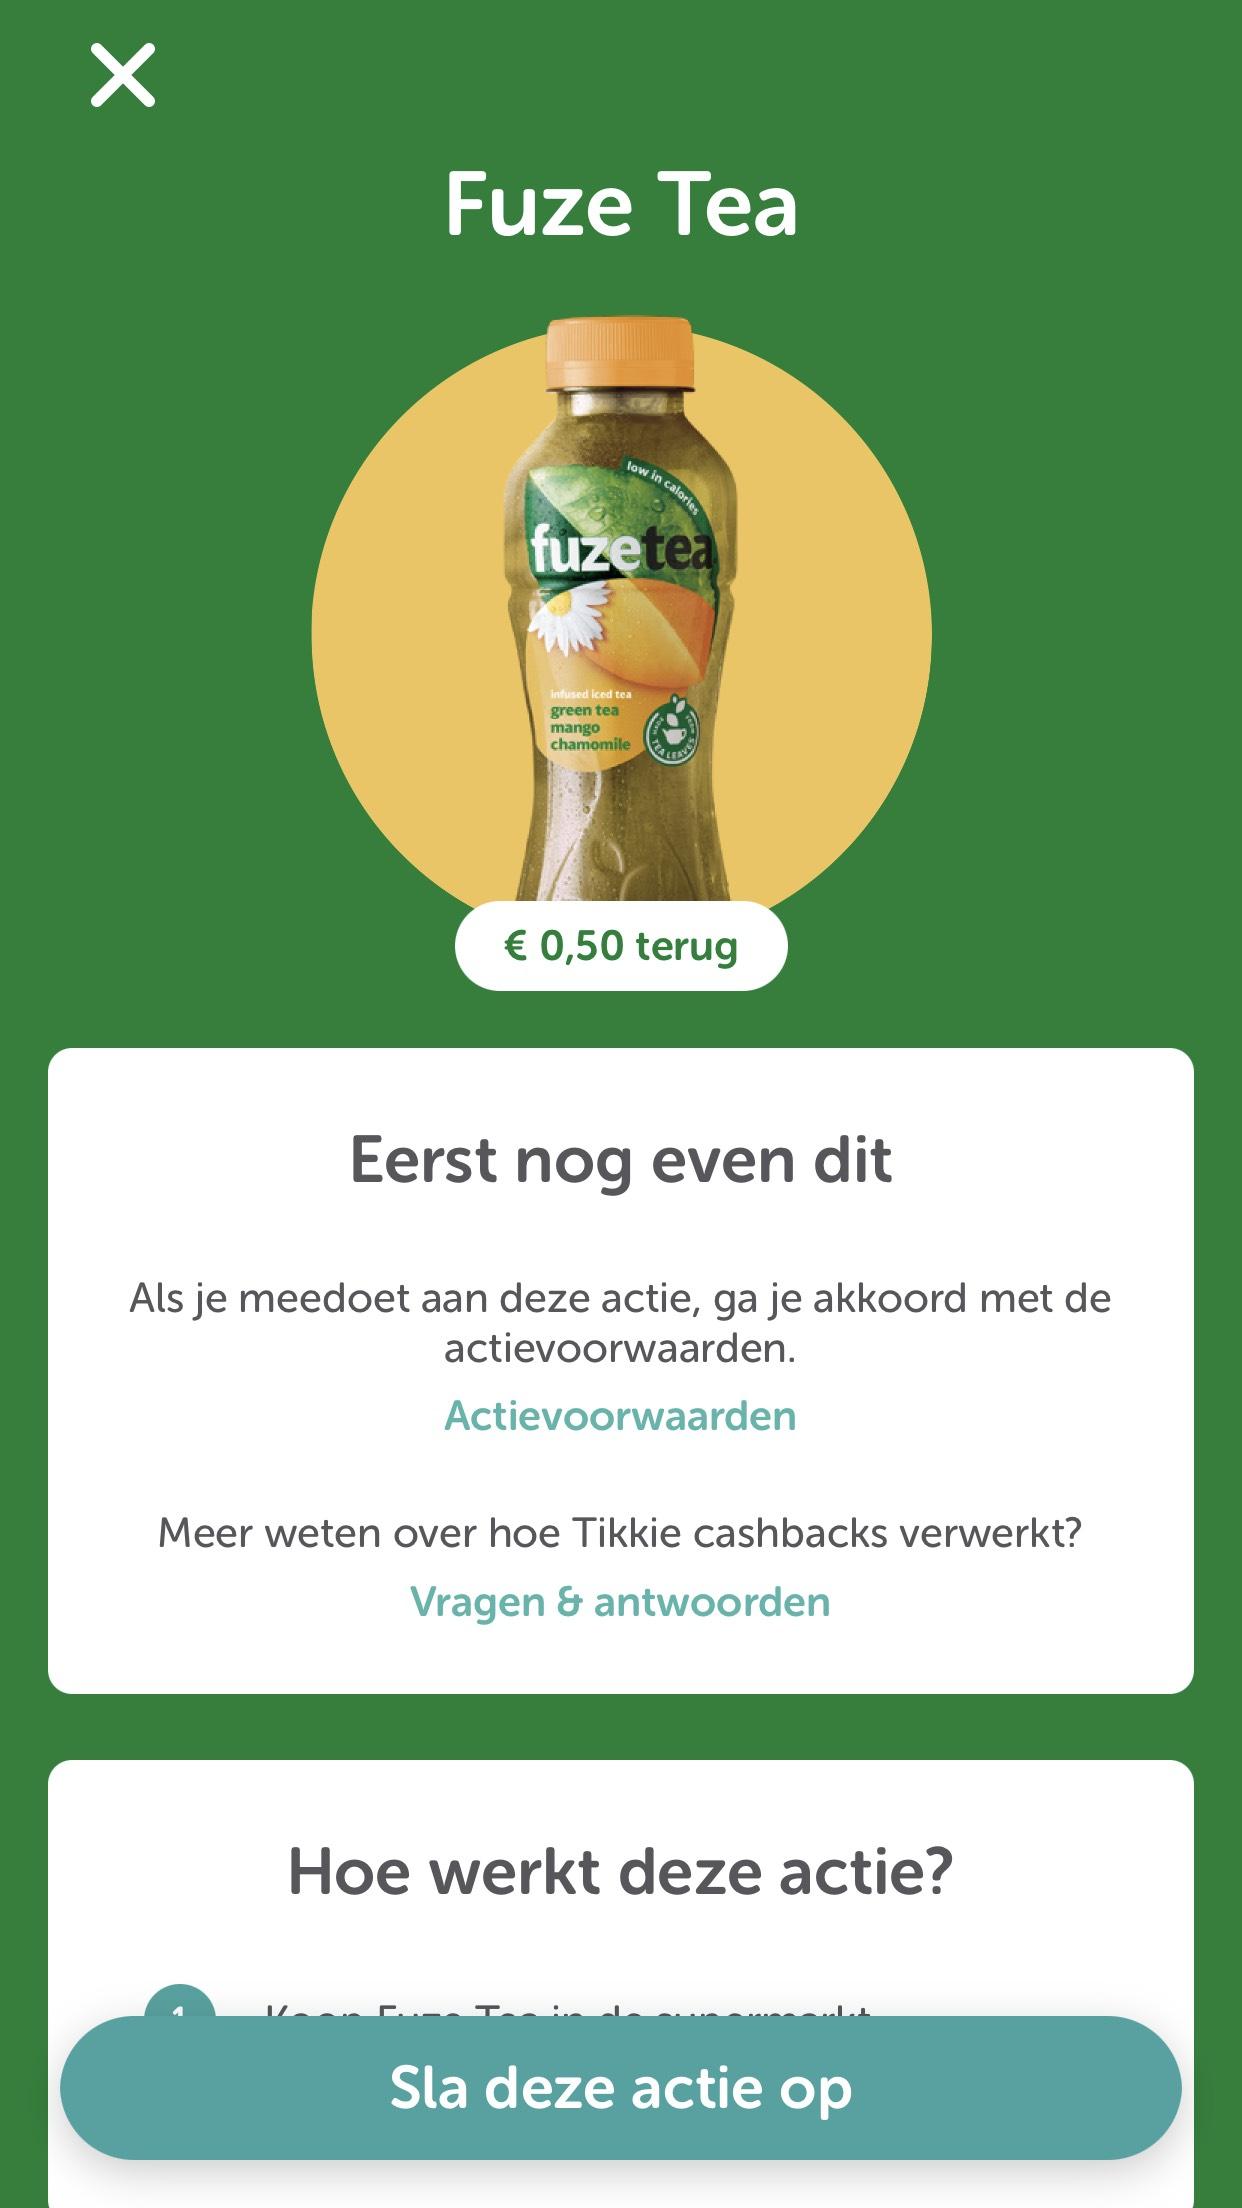 Fuze tea tikkie €0,50 cashback